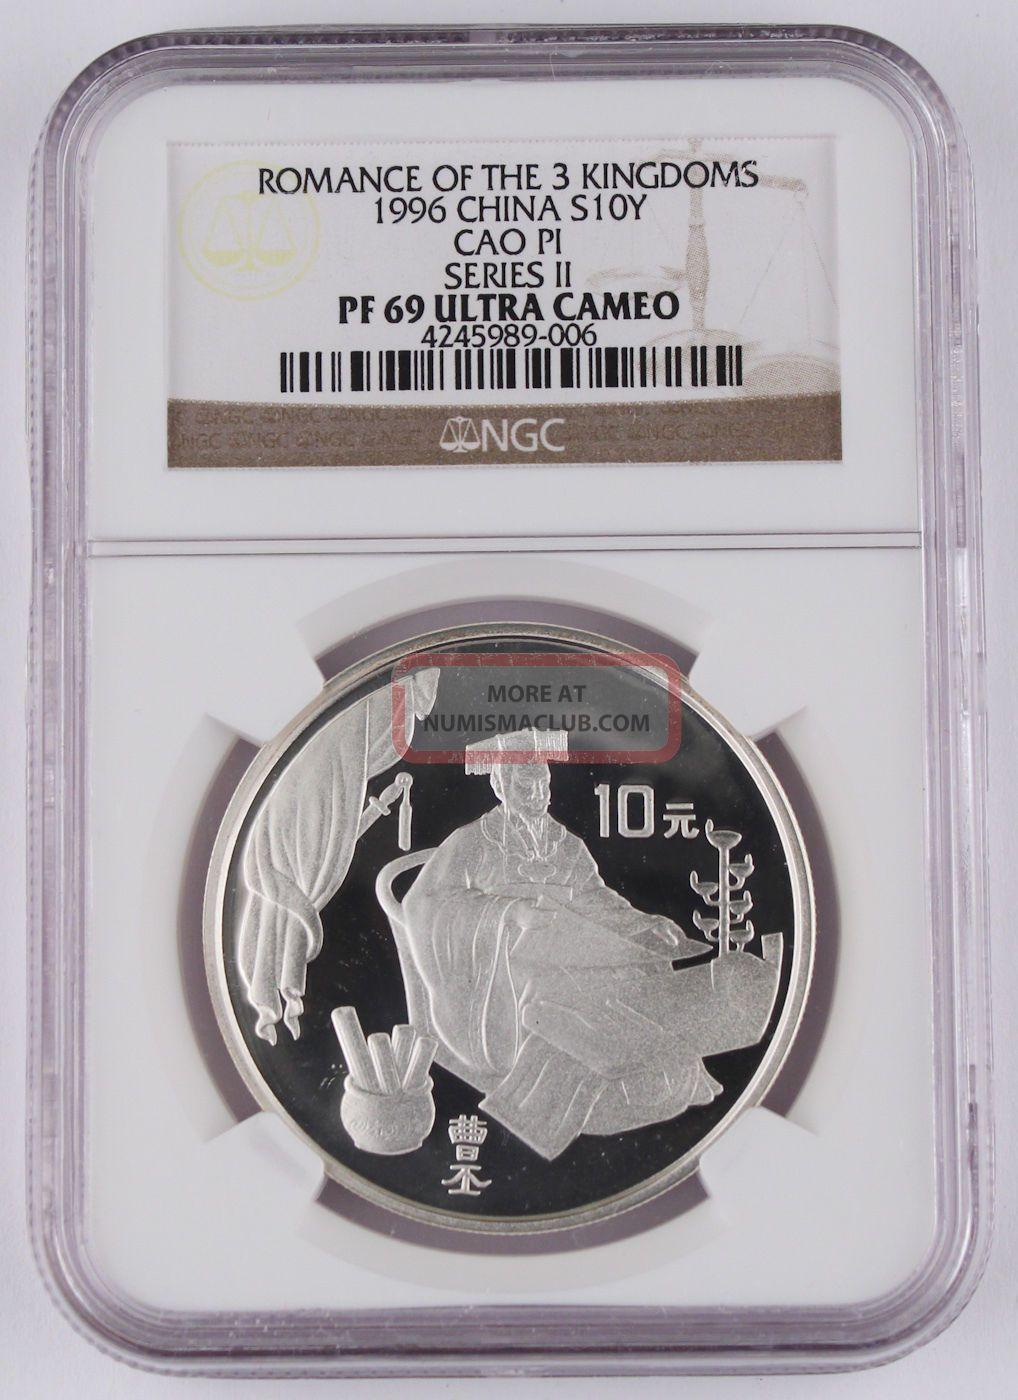 China 1996 Romance Of 3 Kingdoms - Cao Pi 10 Yuan 1 Oz Silver Proof Coin Ngc Pf69 China photo